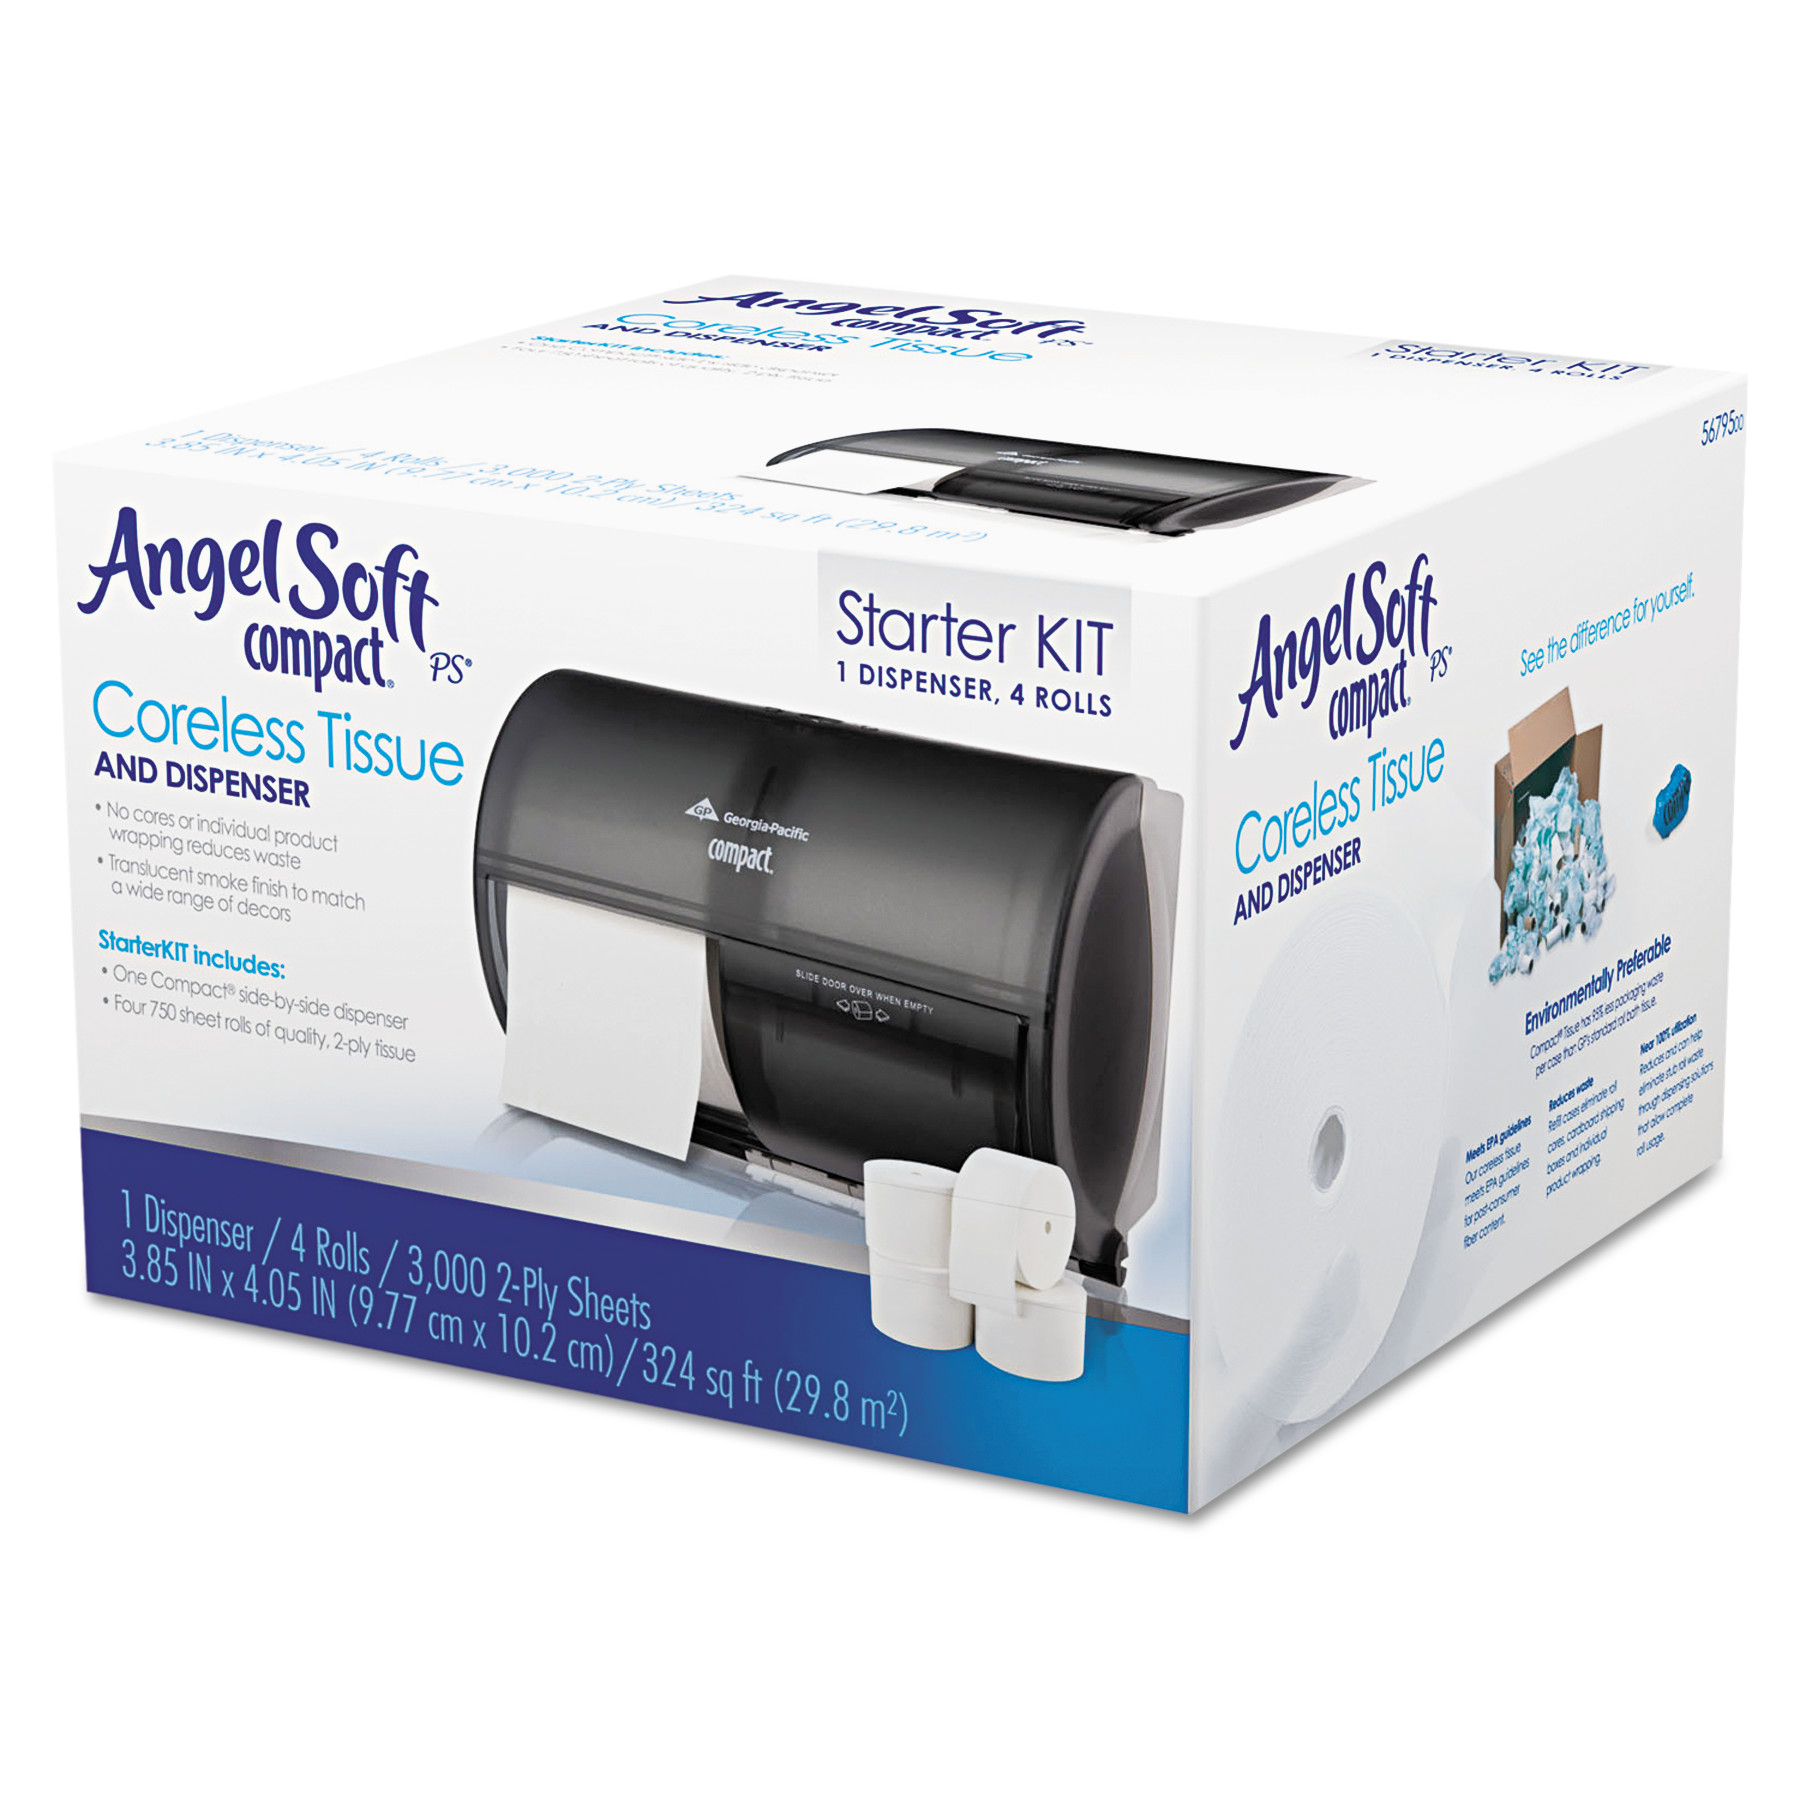 Angel Soft Compact Careless Tissue and Dispenser Start Kit, 5 pc